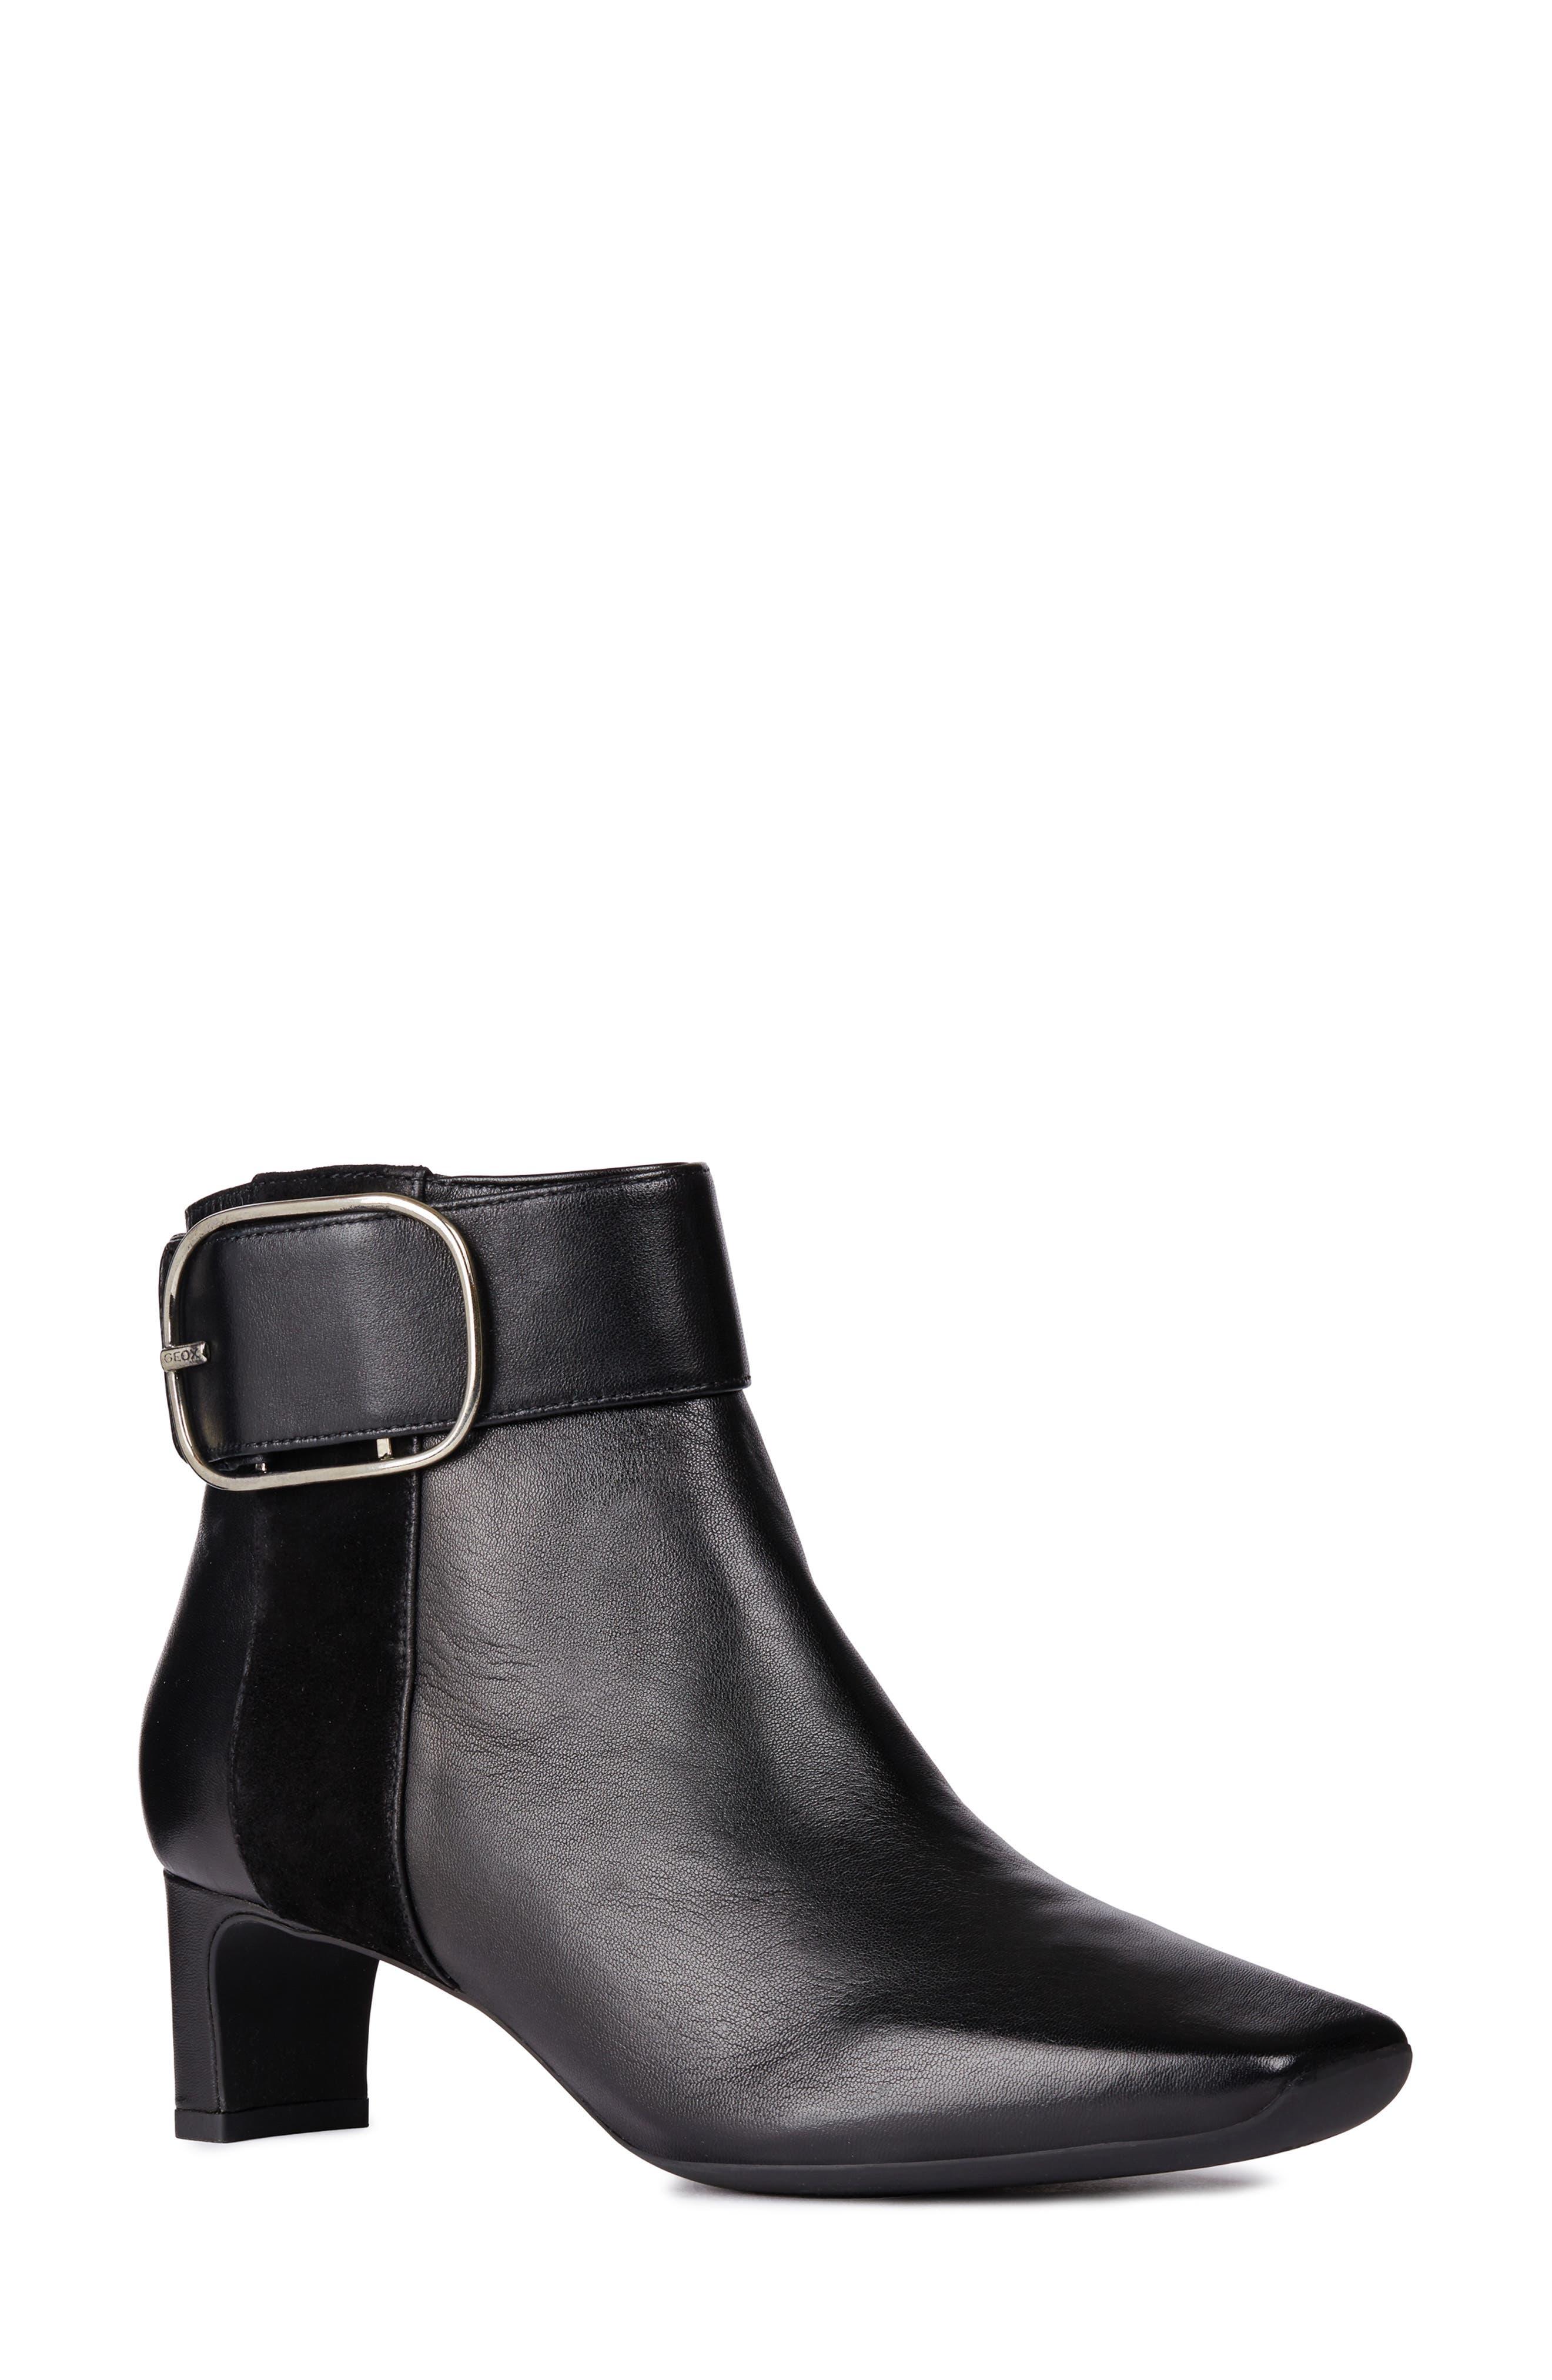 GEOX Vivyanne Bootie in Black Leather